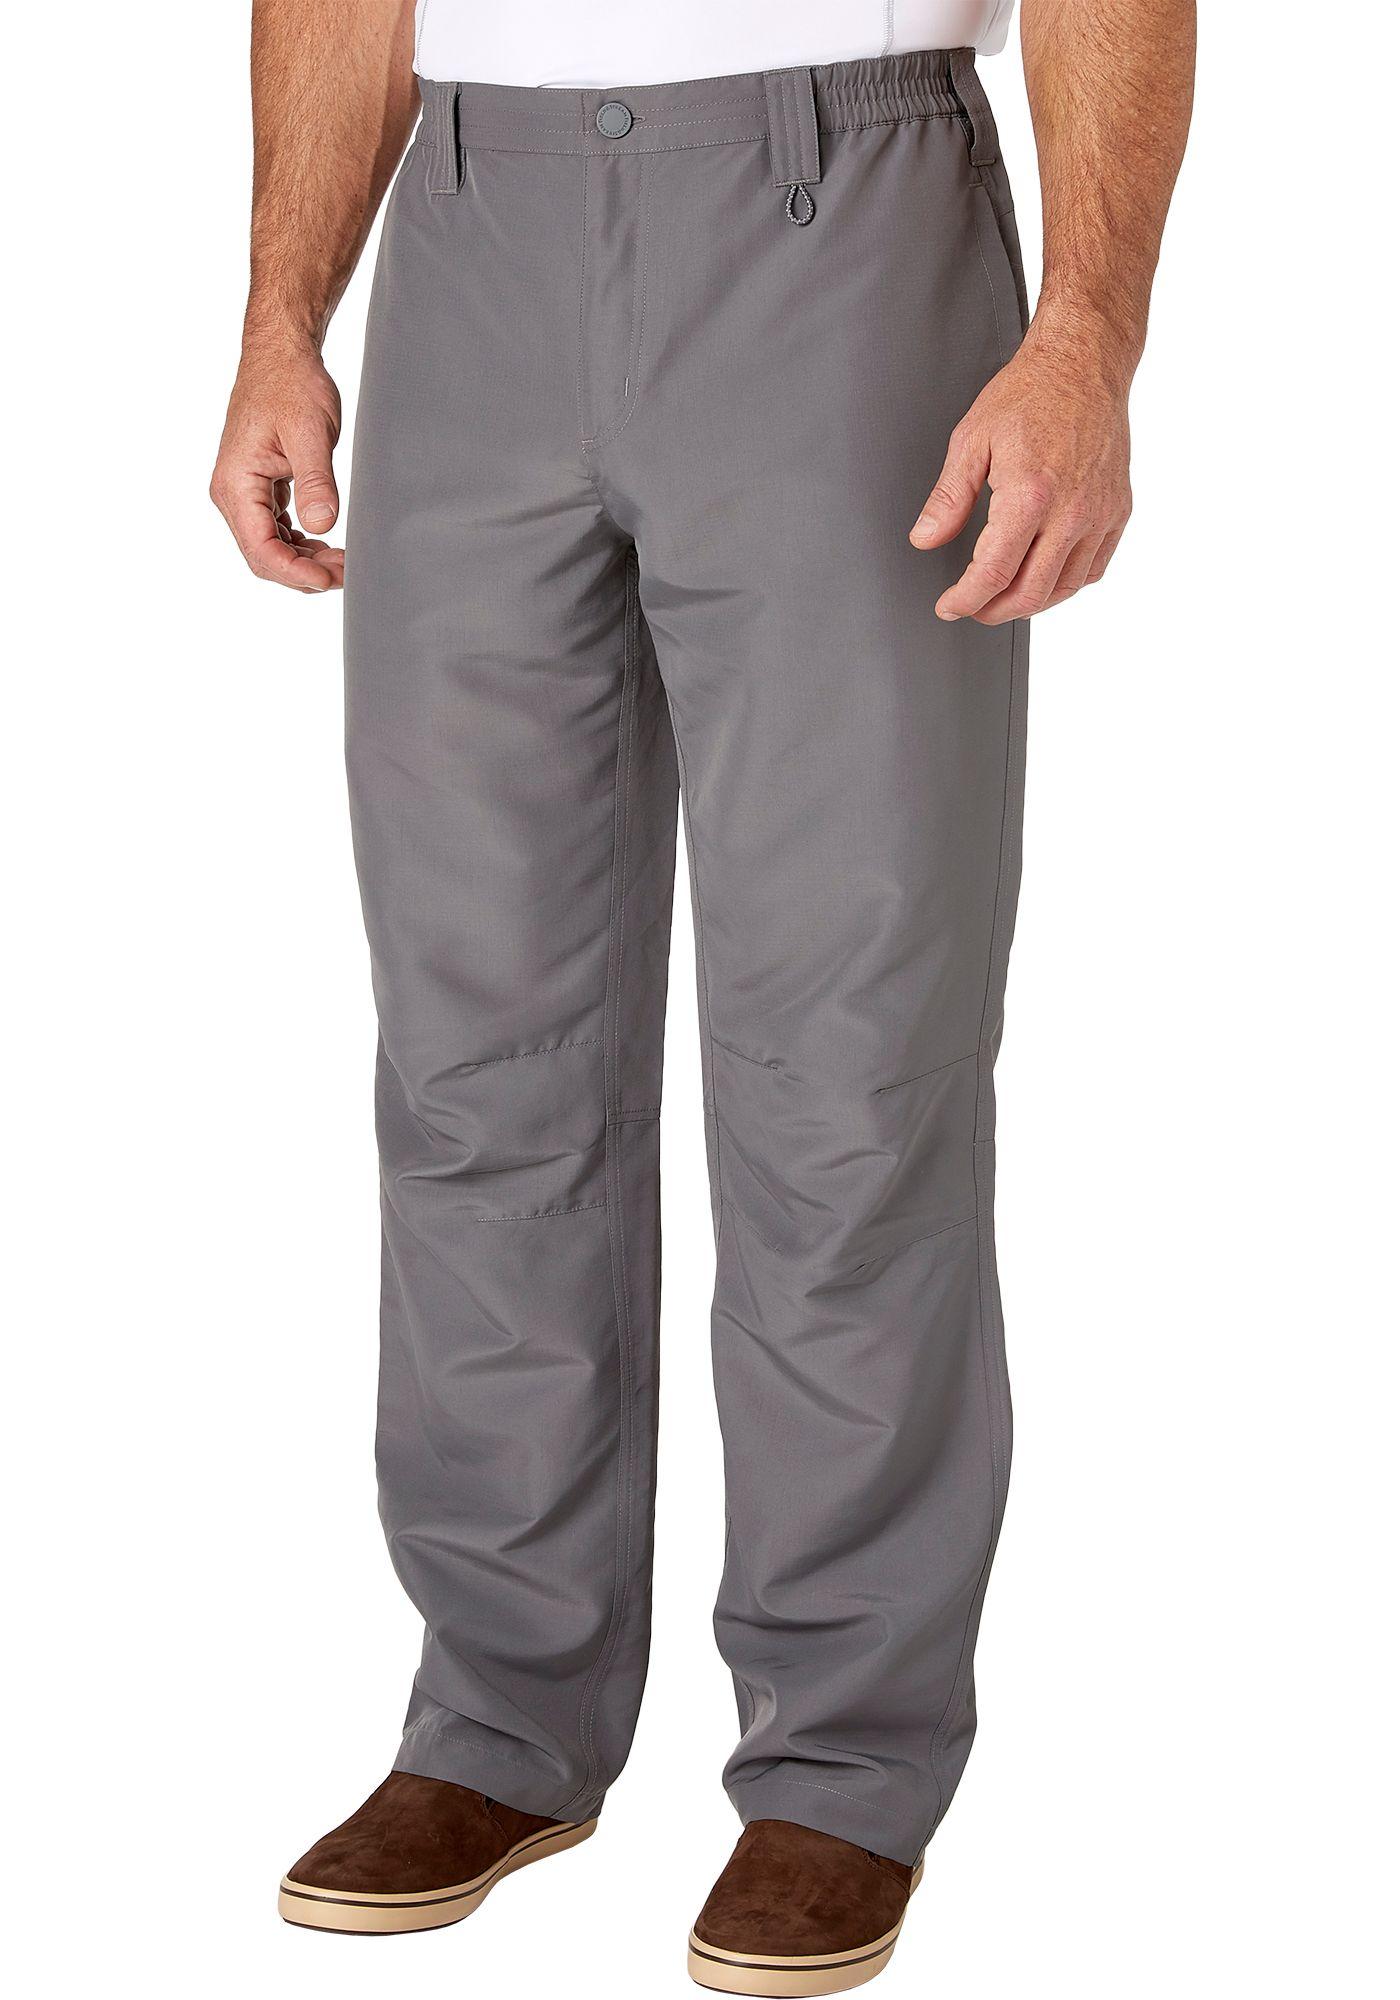 Field & Stream Men's Harbor Fishing Pants (Regular and Big & Tall)